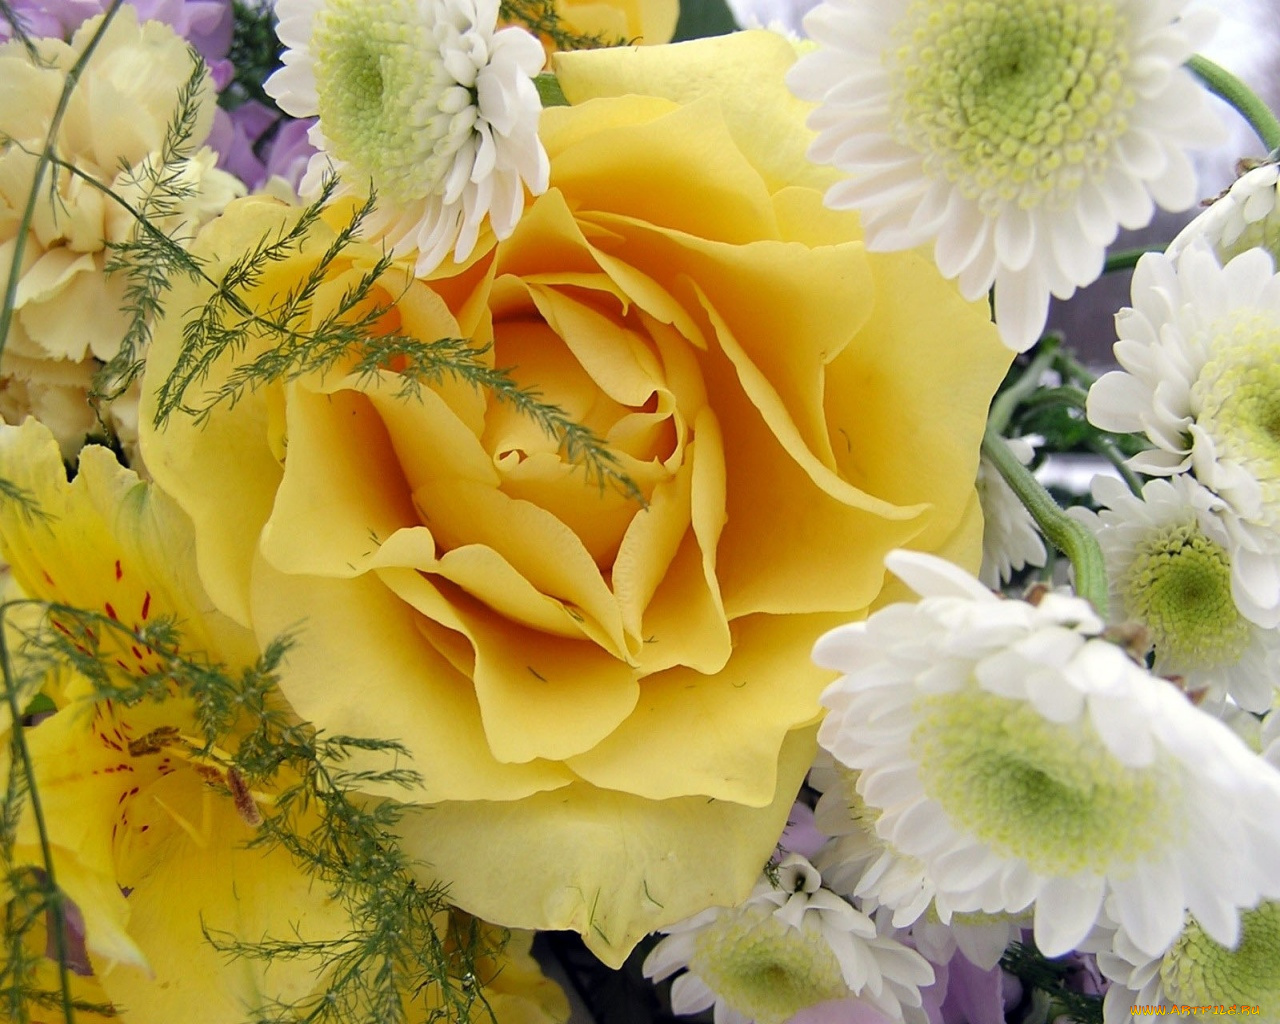 Переписки картинки, желтые цветы открытка